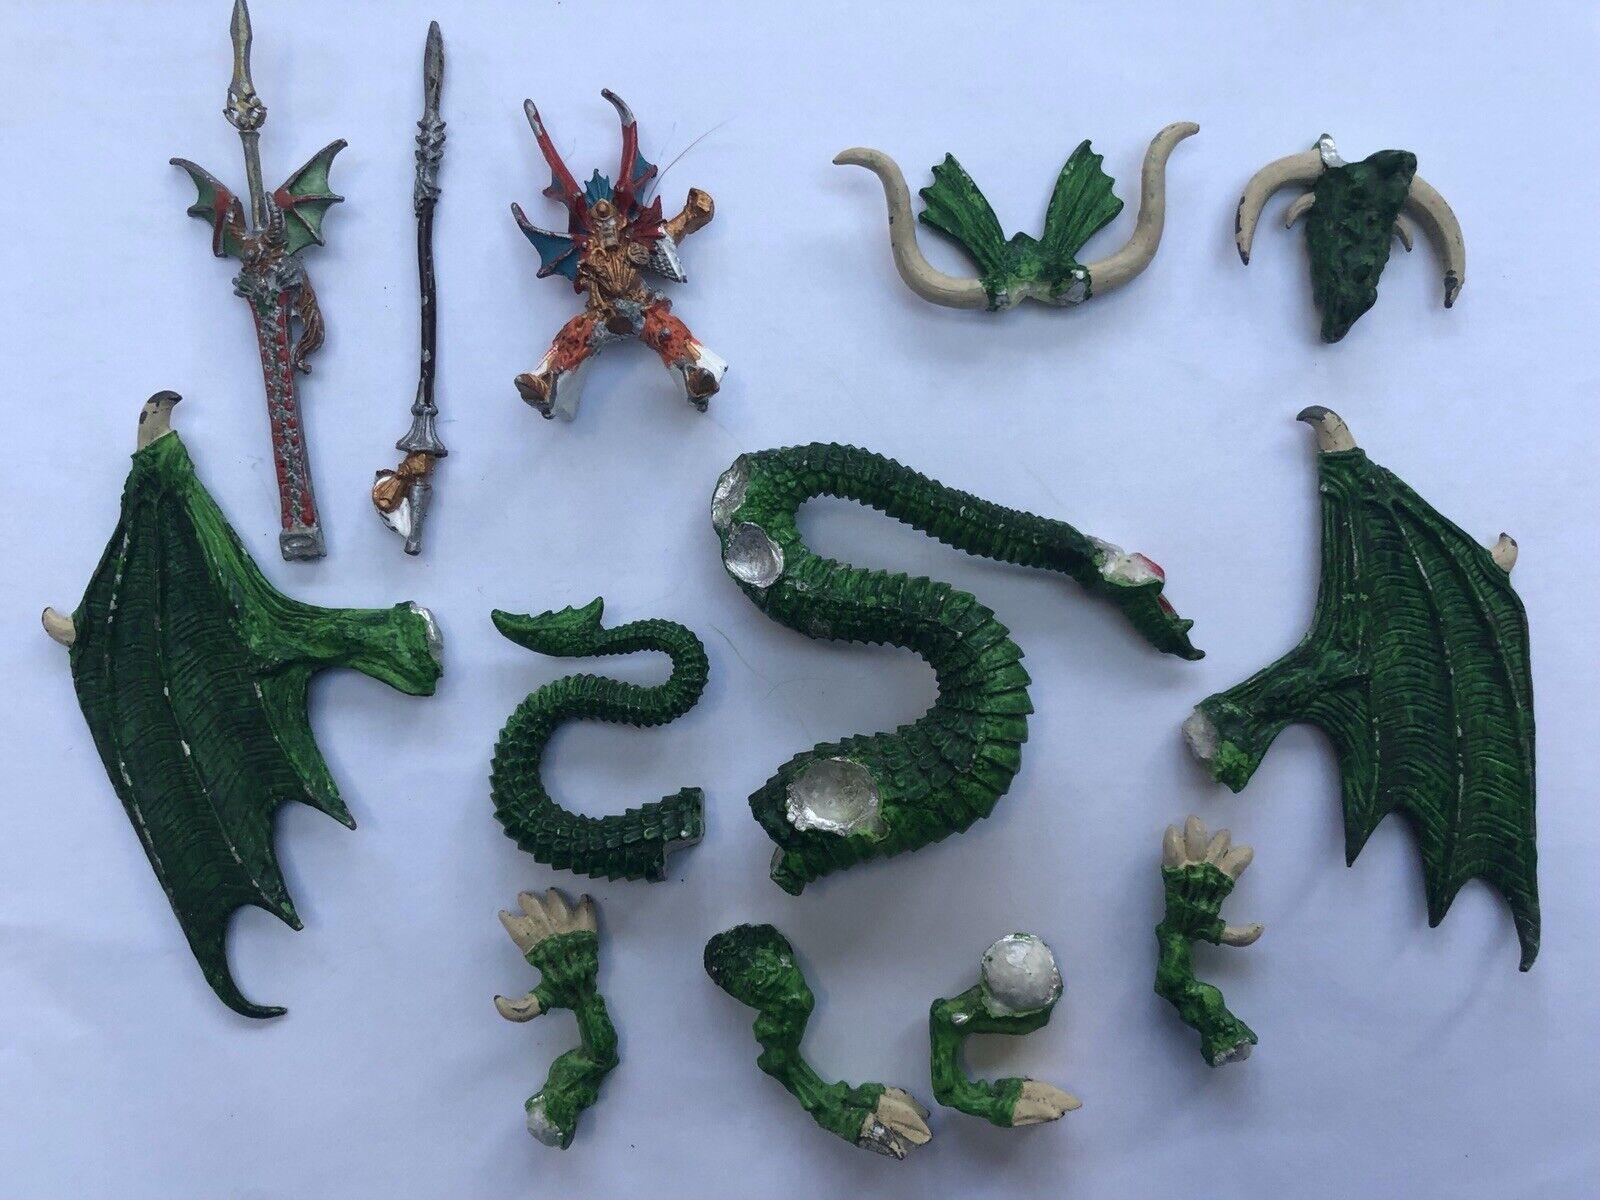 Classic Warhammer High Elf Imrik Lord of Dragons & Dragon OOP metal unboxed WHFB